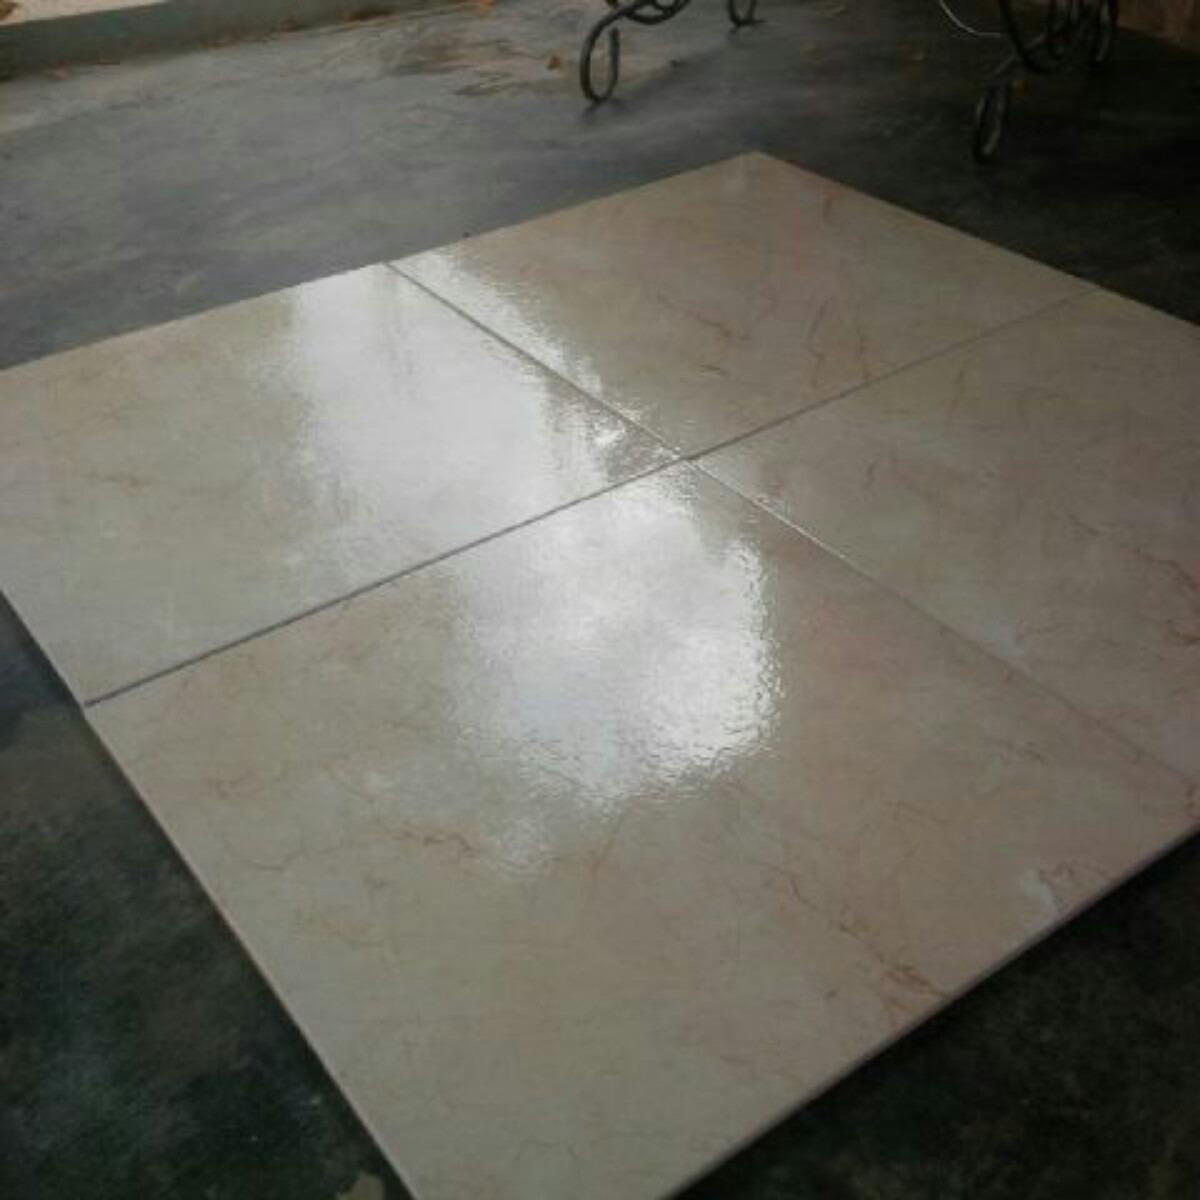 Se vende ceramica para piso de primera 45x45 bs 0 46 en for Ofertas de ceramicas para piso